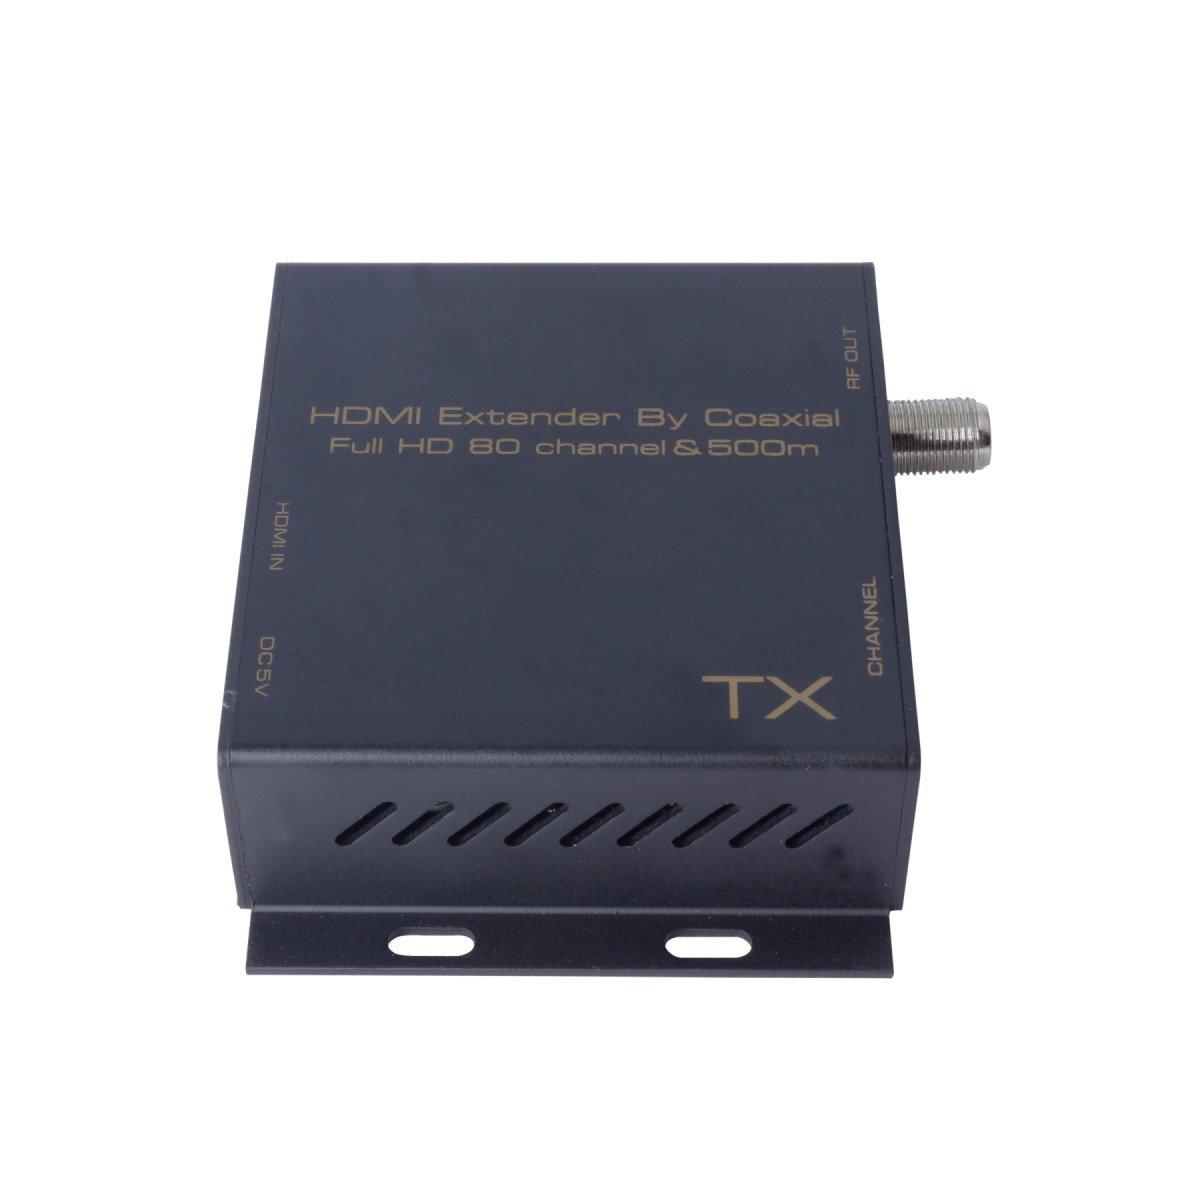 WenL HDMI A RF/COAX Modulador DVB-T Inpurt HDMI Y Salida/COAX RF Soporte Full HD 1080p/60Hz: Amazon.es: Deportes y aire libre